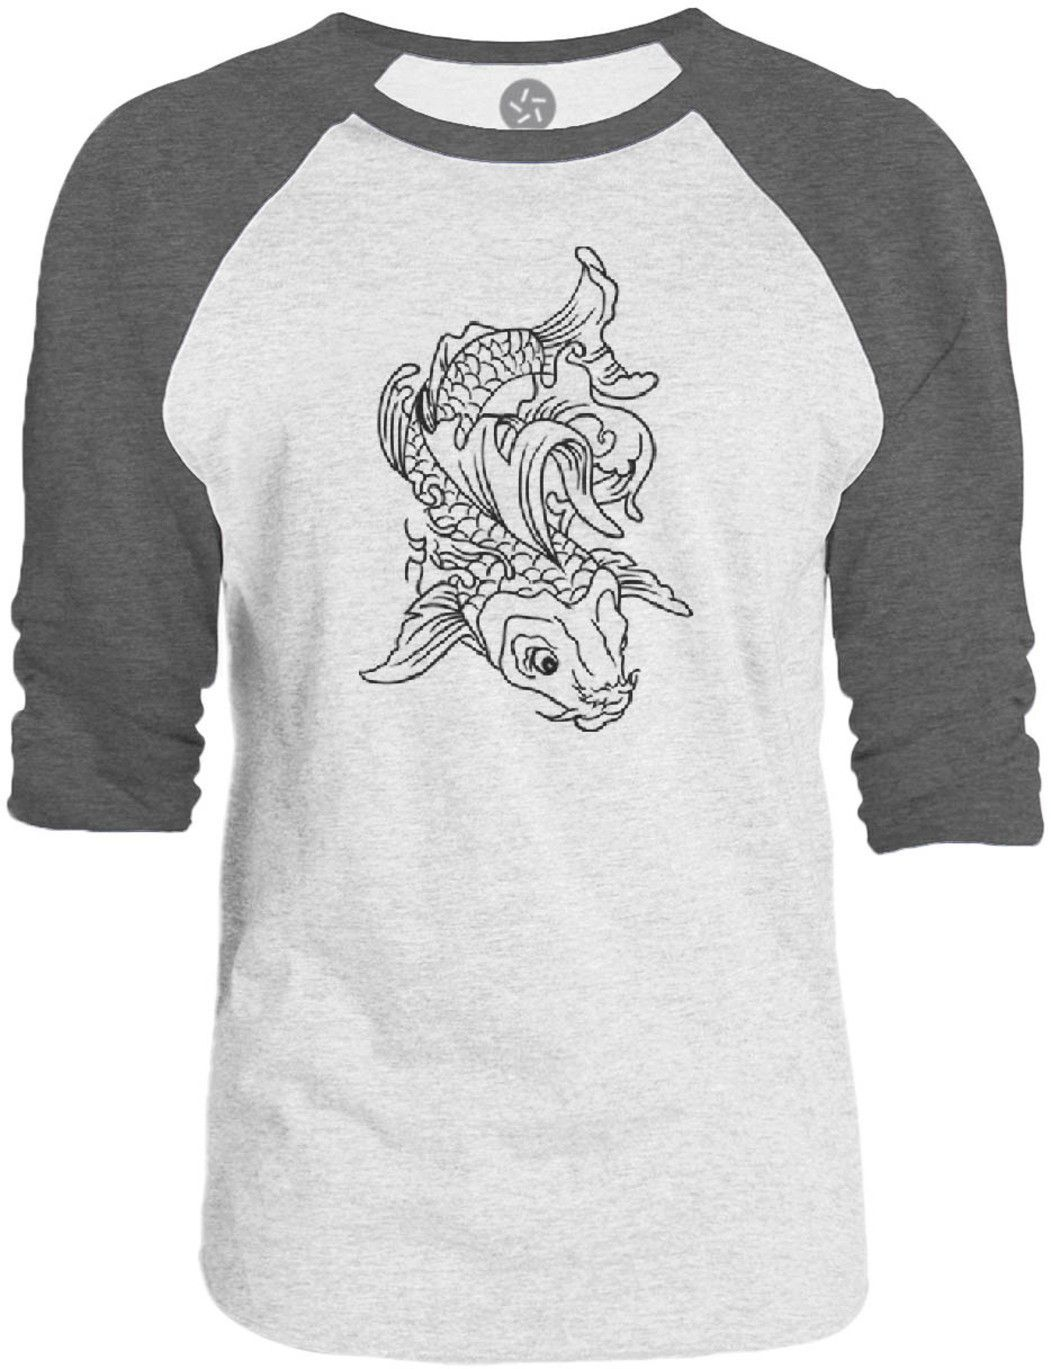 Big Texas Eastern Koi Tattoo (Black) 3/4-Sleeve Raglan Baseball T-Shirt